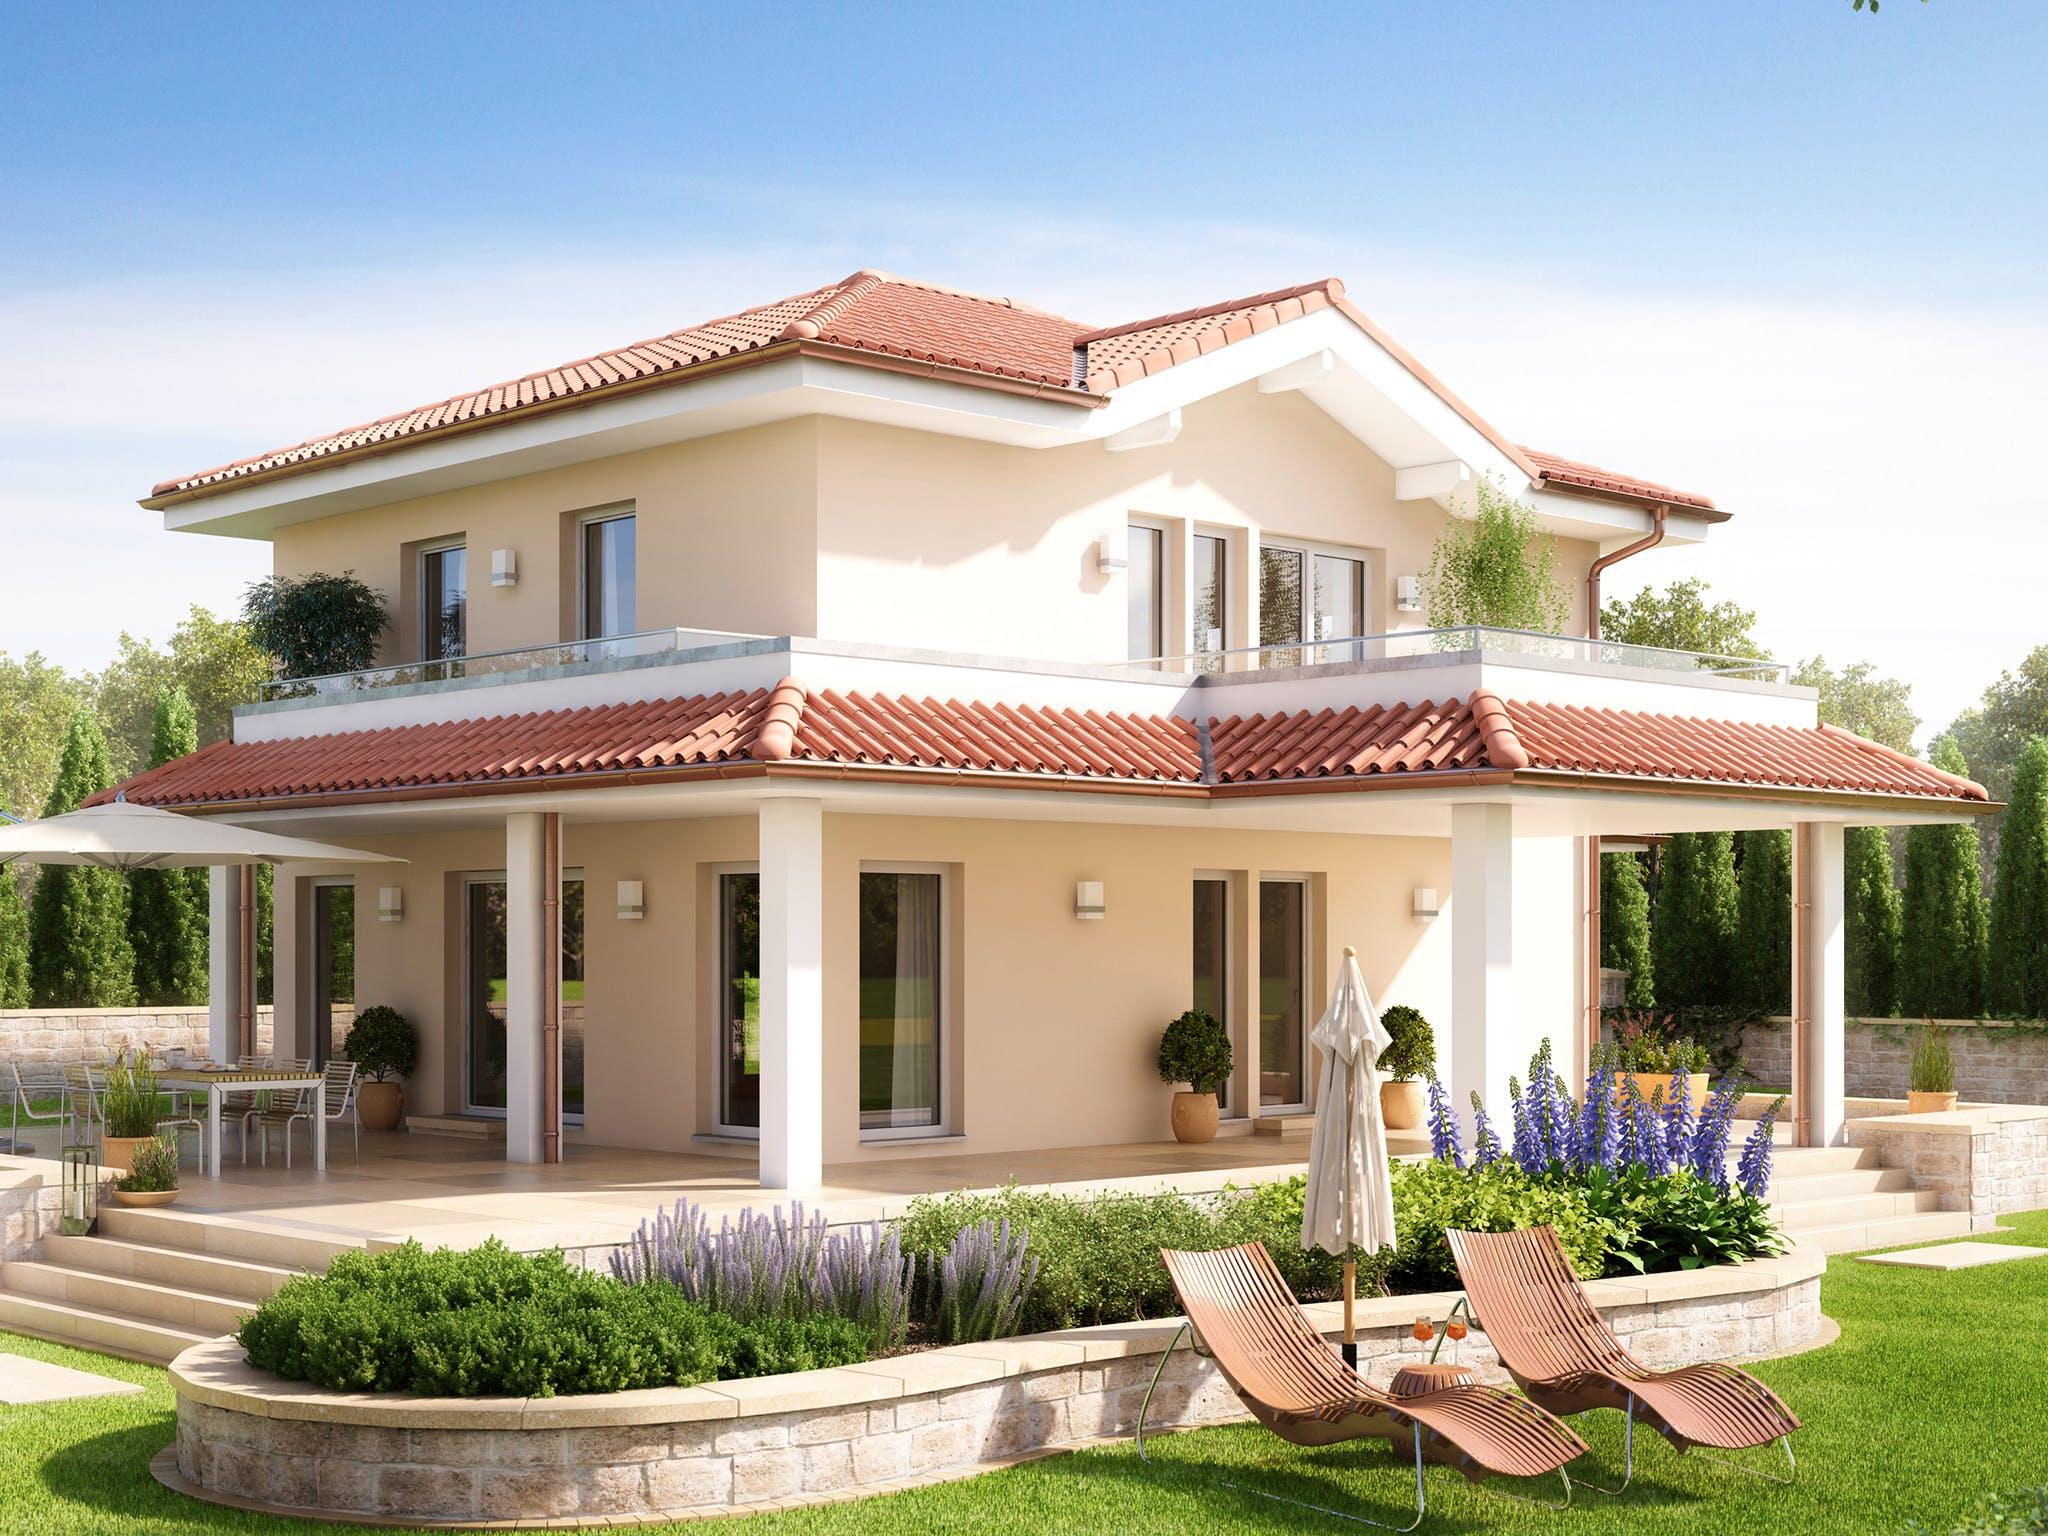 Haus Bauen Ideen Mediterran Vitaplaza Info